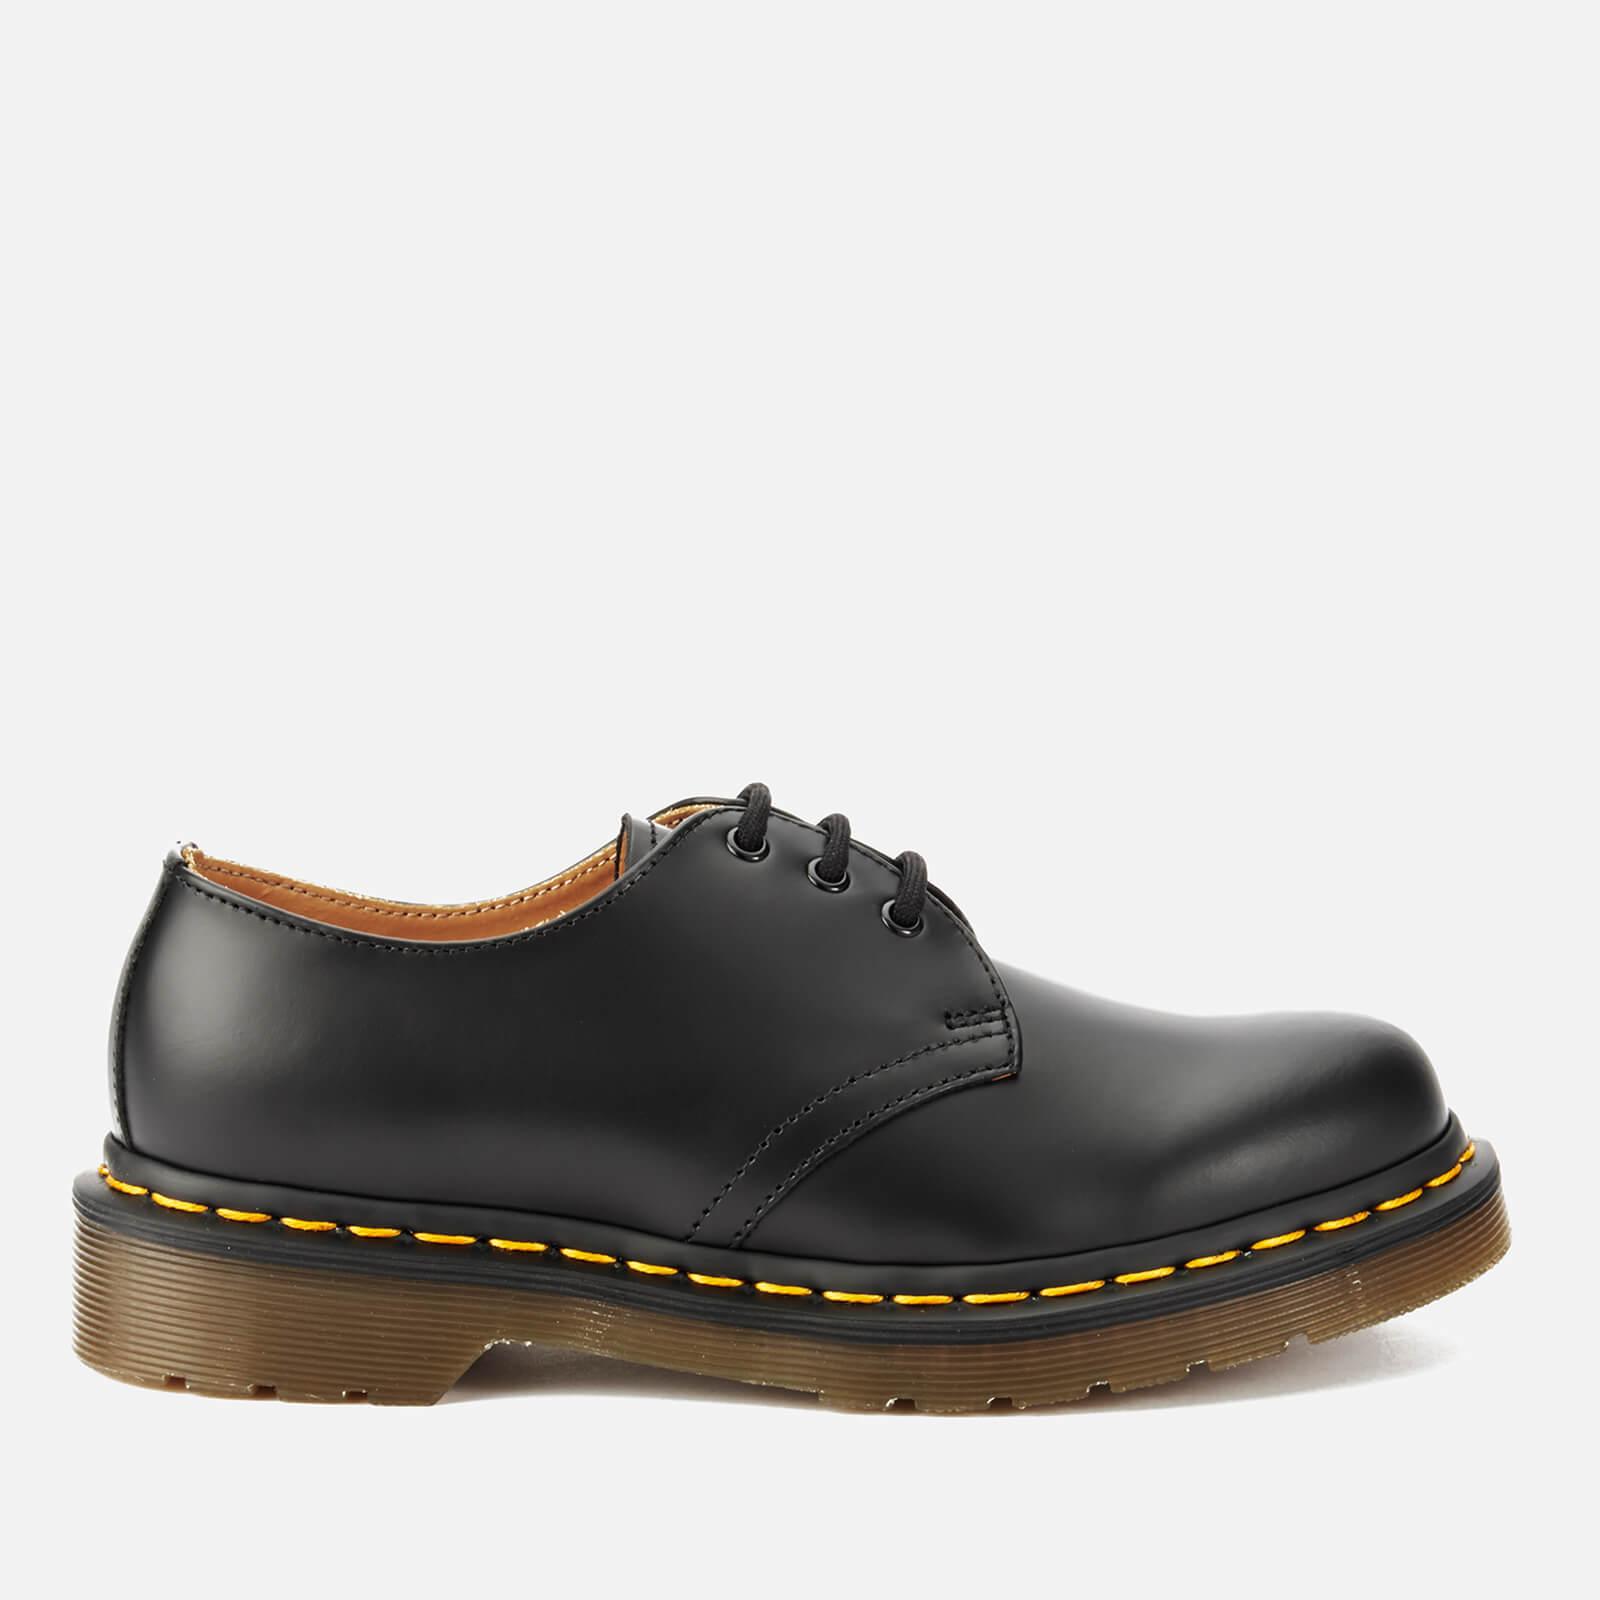 Dr. Martens 1461 Smooth Leather 3-Eye Shoes - Black - UK 9